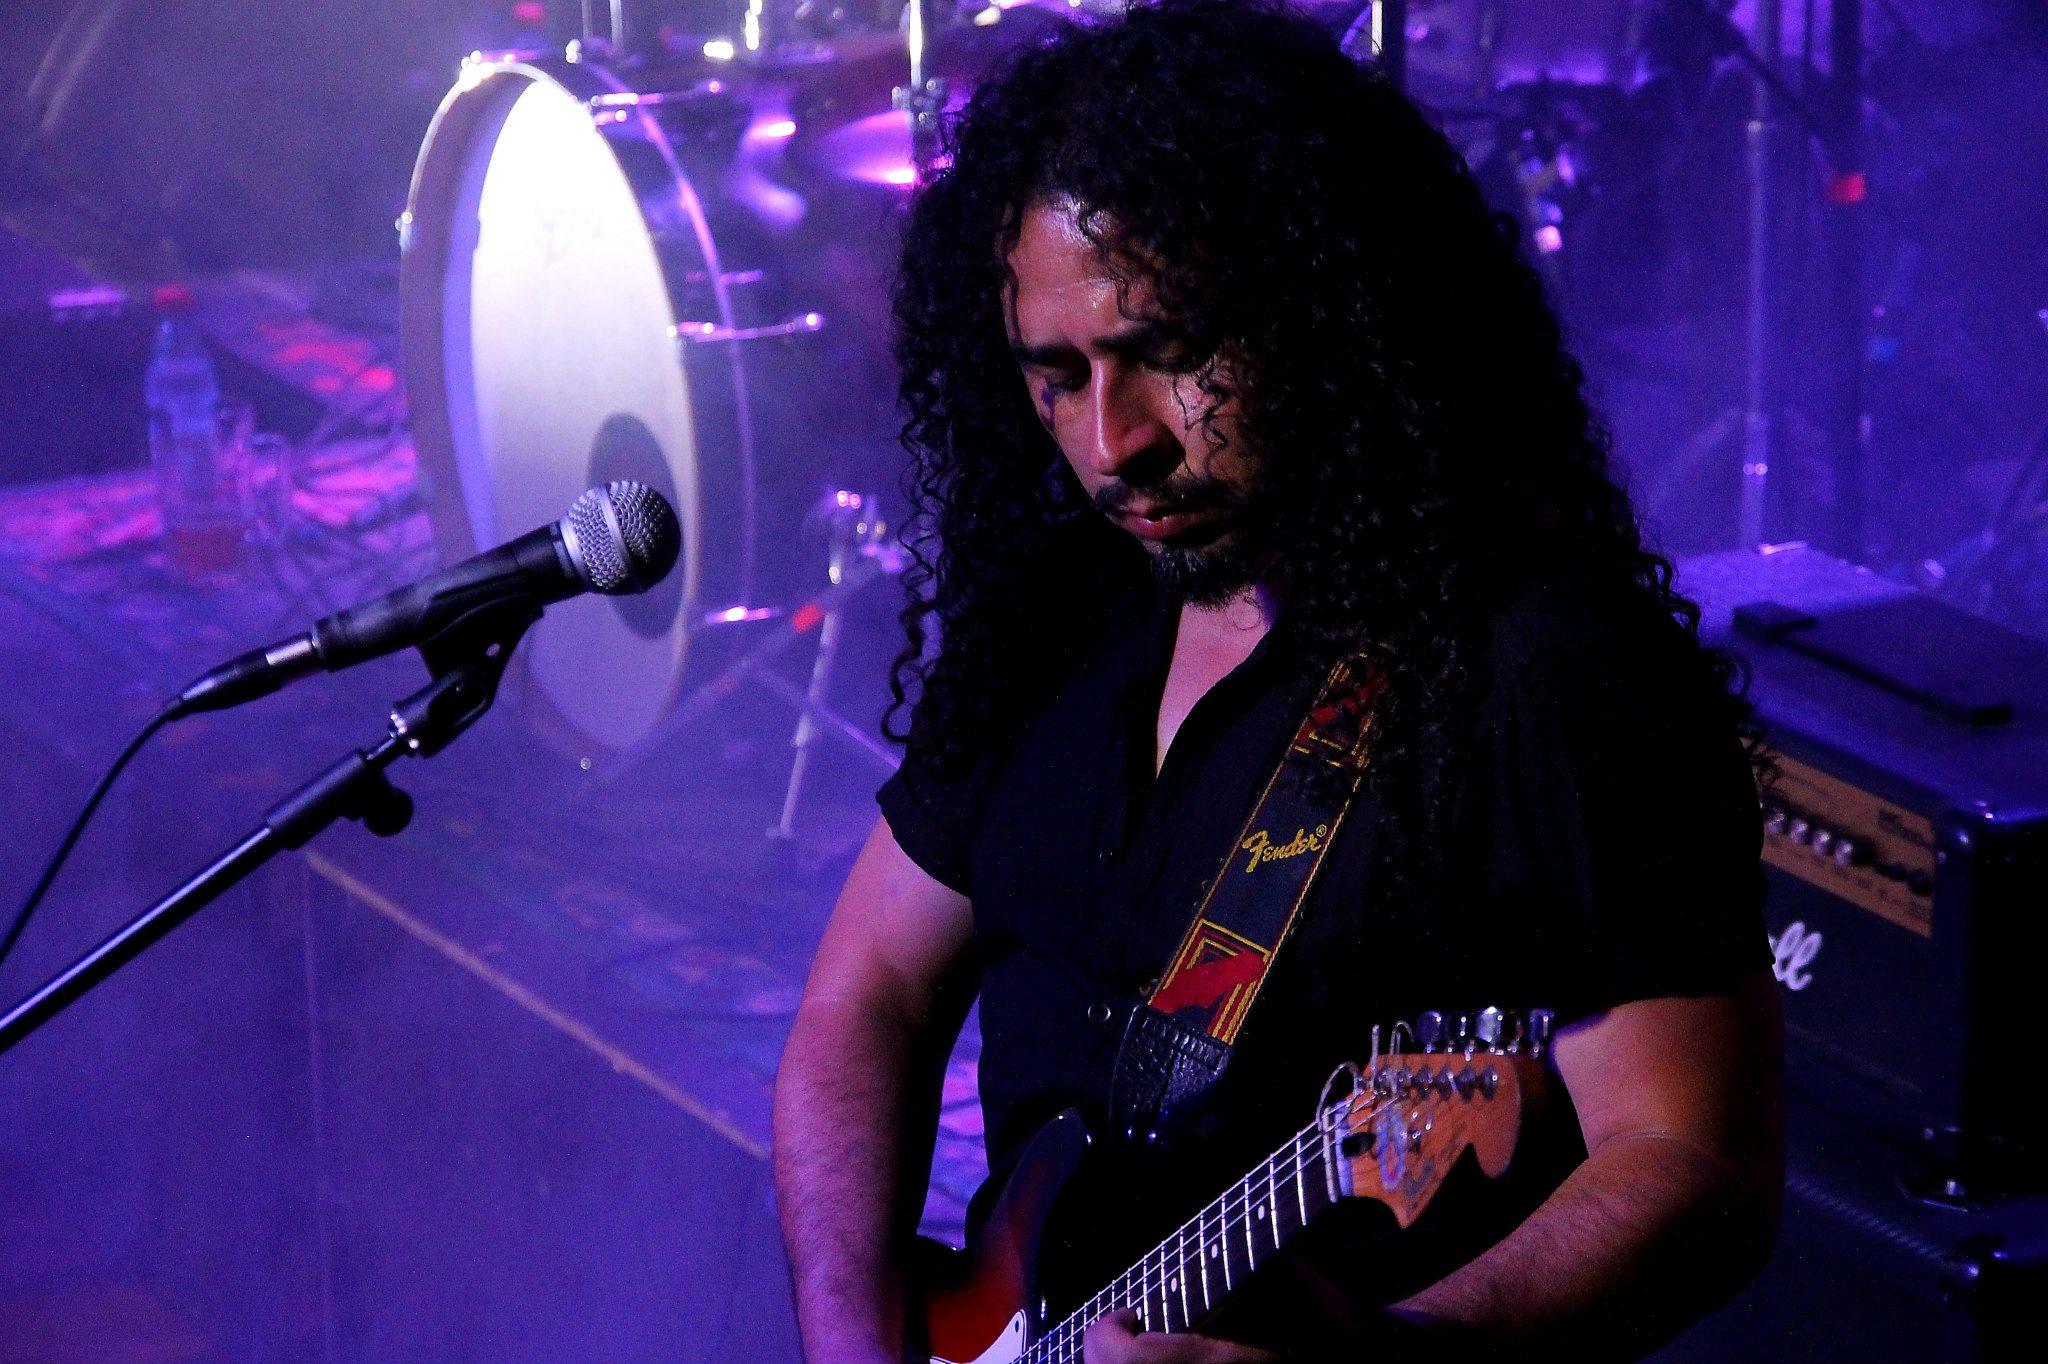 Juez formalizado por cuasidelito de homicidio condenó a reclusión nocturna a músico por pegar afiches